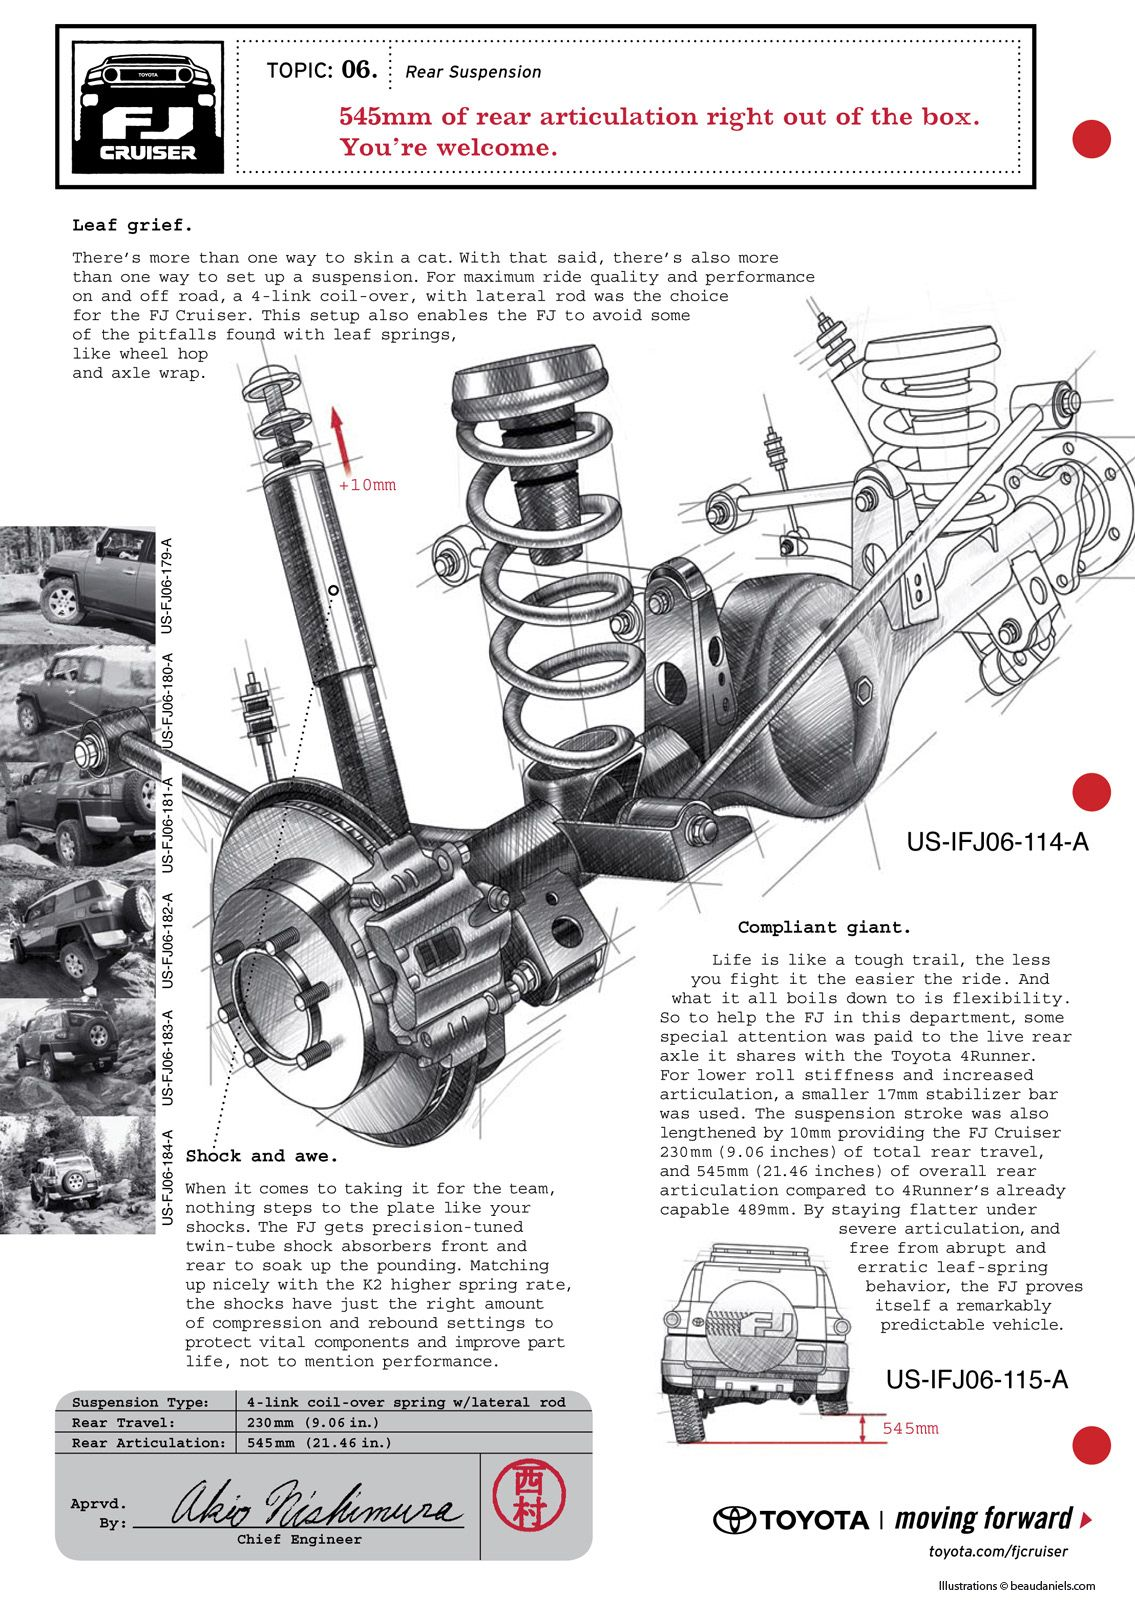 hight resolution of fj cruiser ads rear suspension technical illustration toyota fjfj cruiser ads rear suspension technical illustration